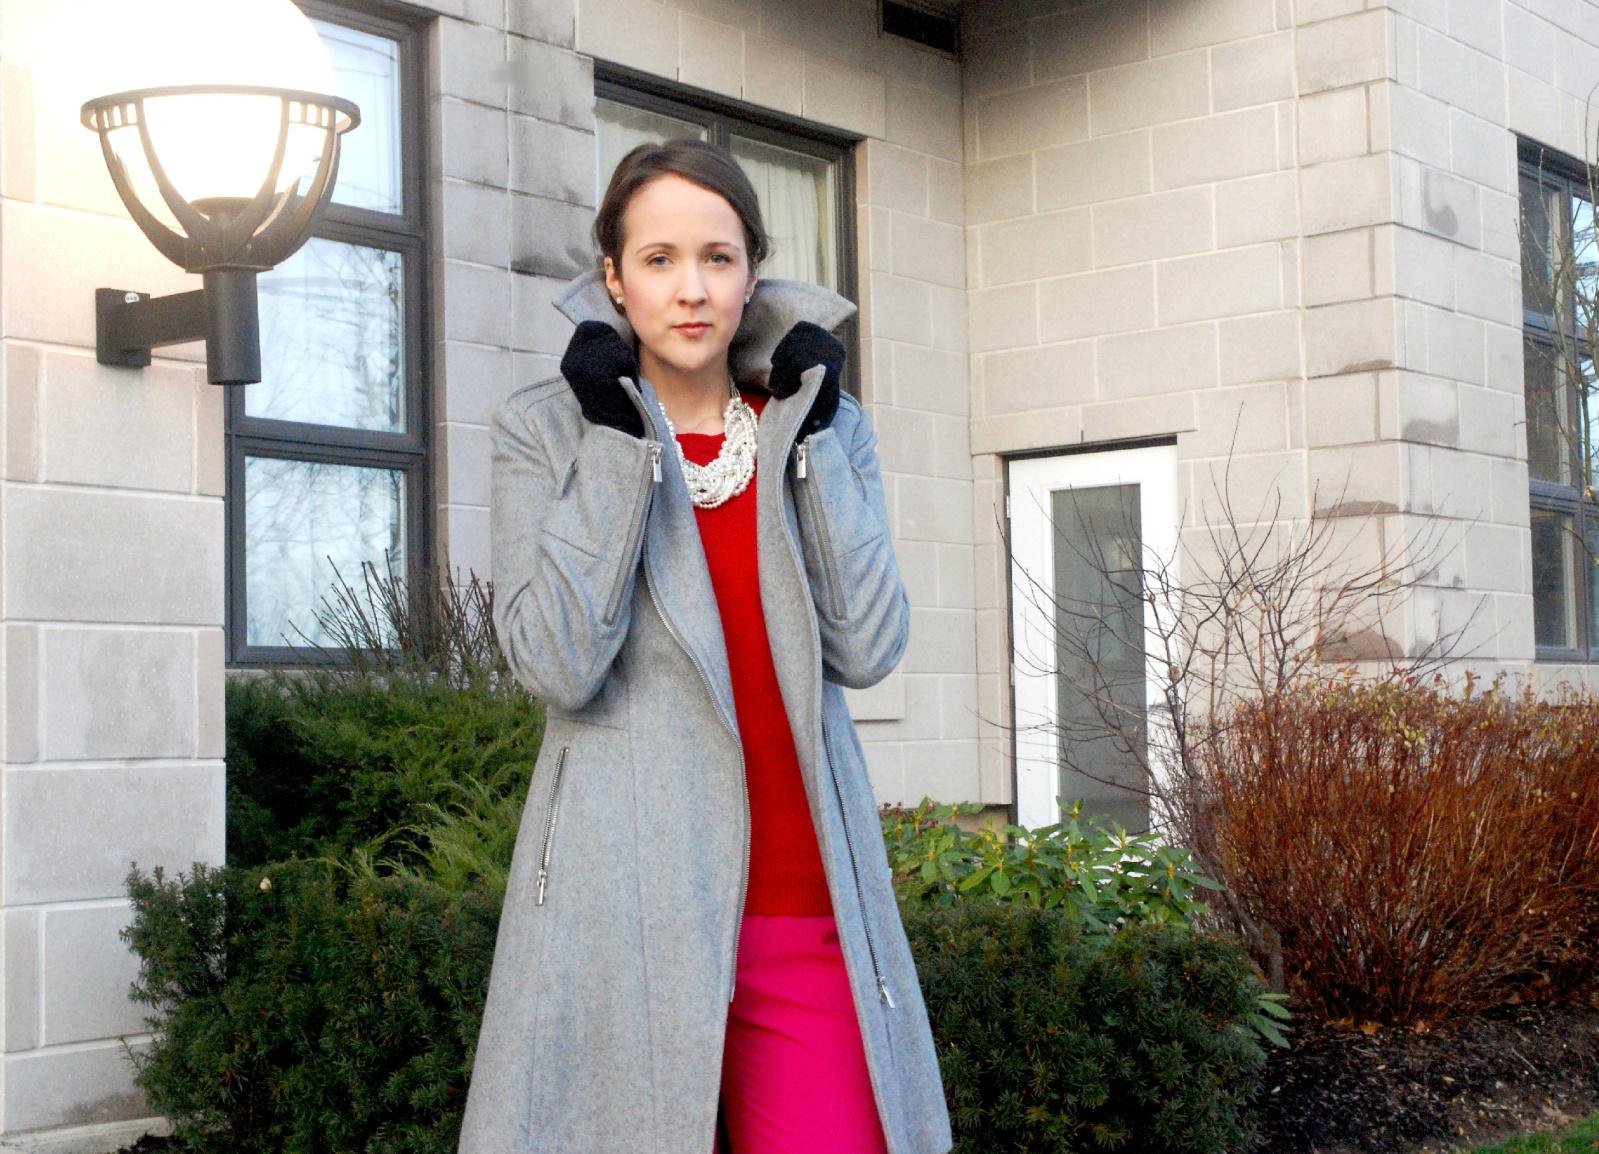 Zara Canada, Holiday looks, Pink and Red, Zara Canada, Gray Coat, Style Panel, Fashion Magazine, Stylelist Canda